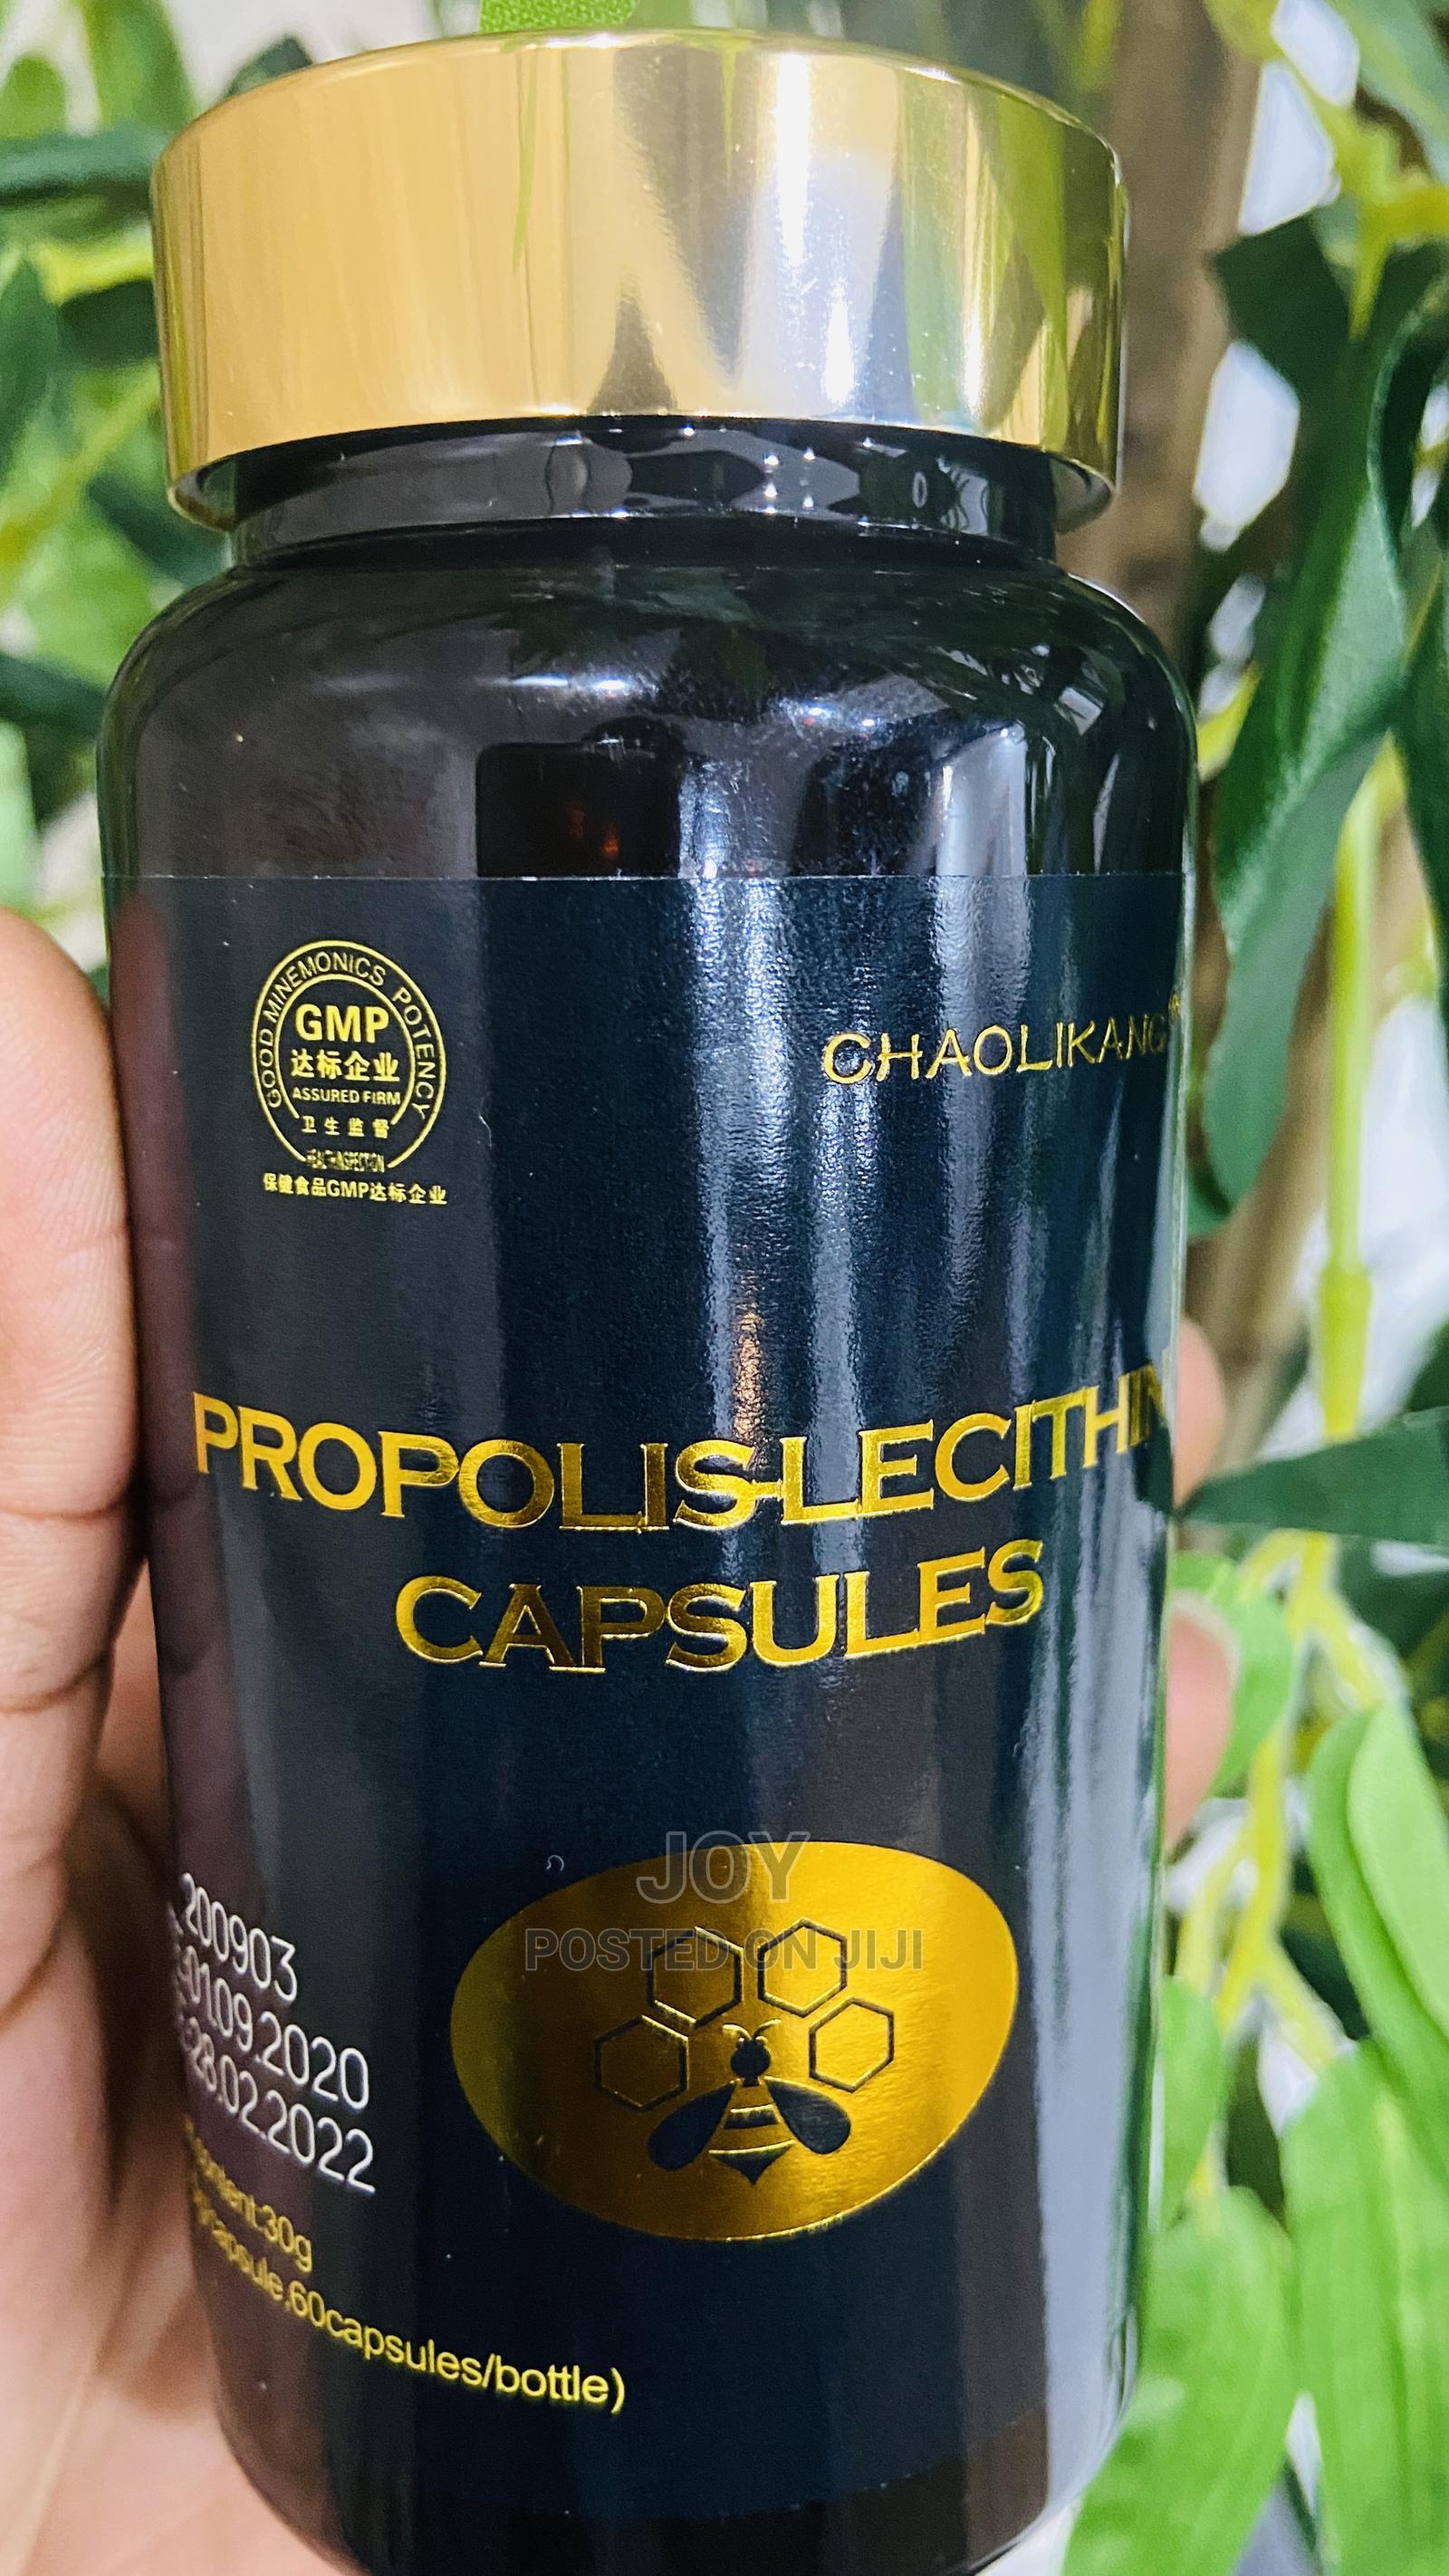 Propolis Lecithin